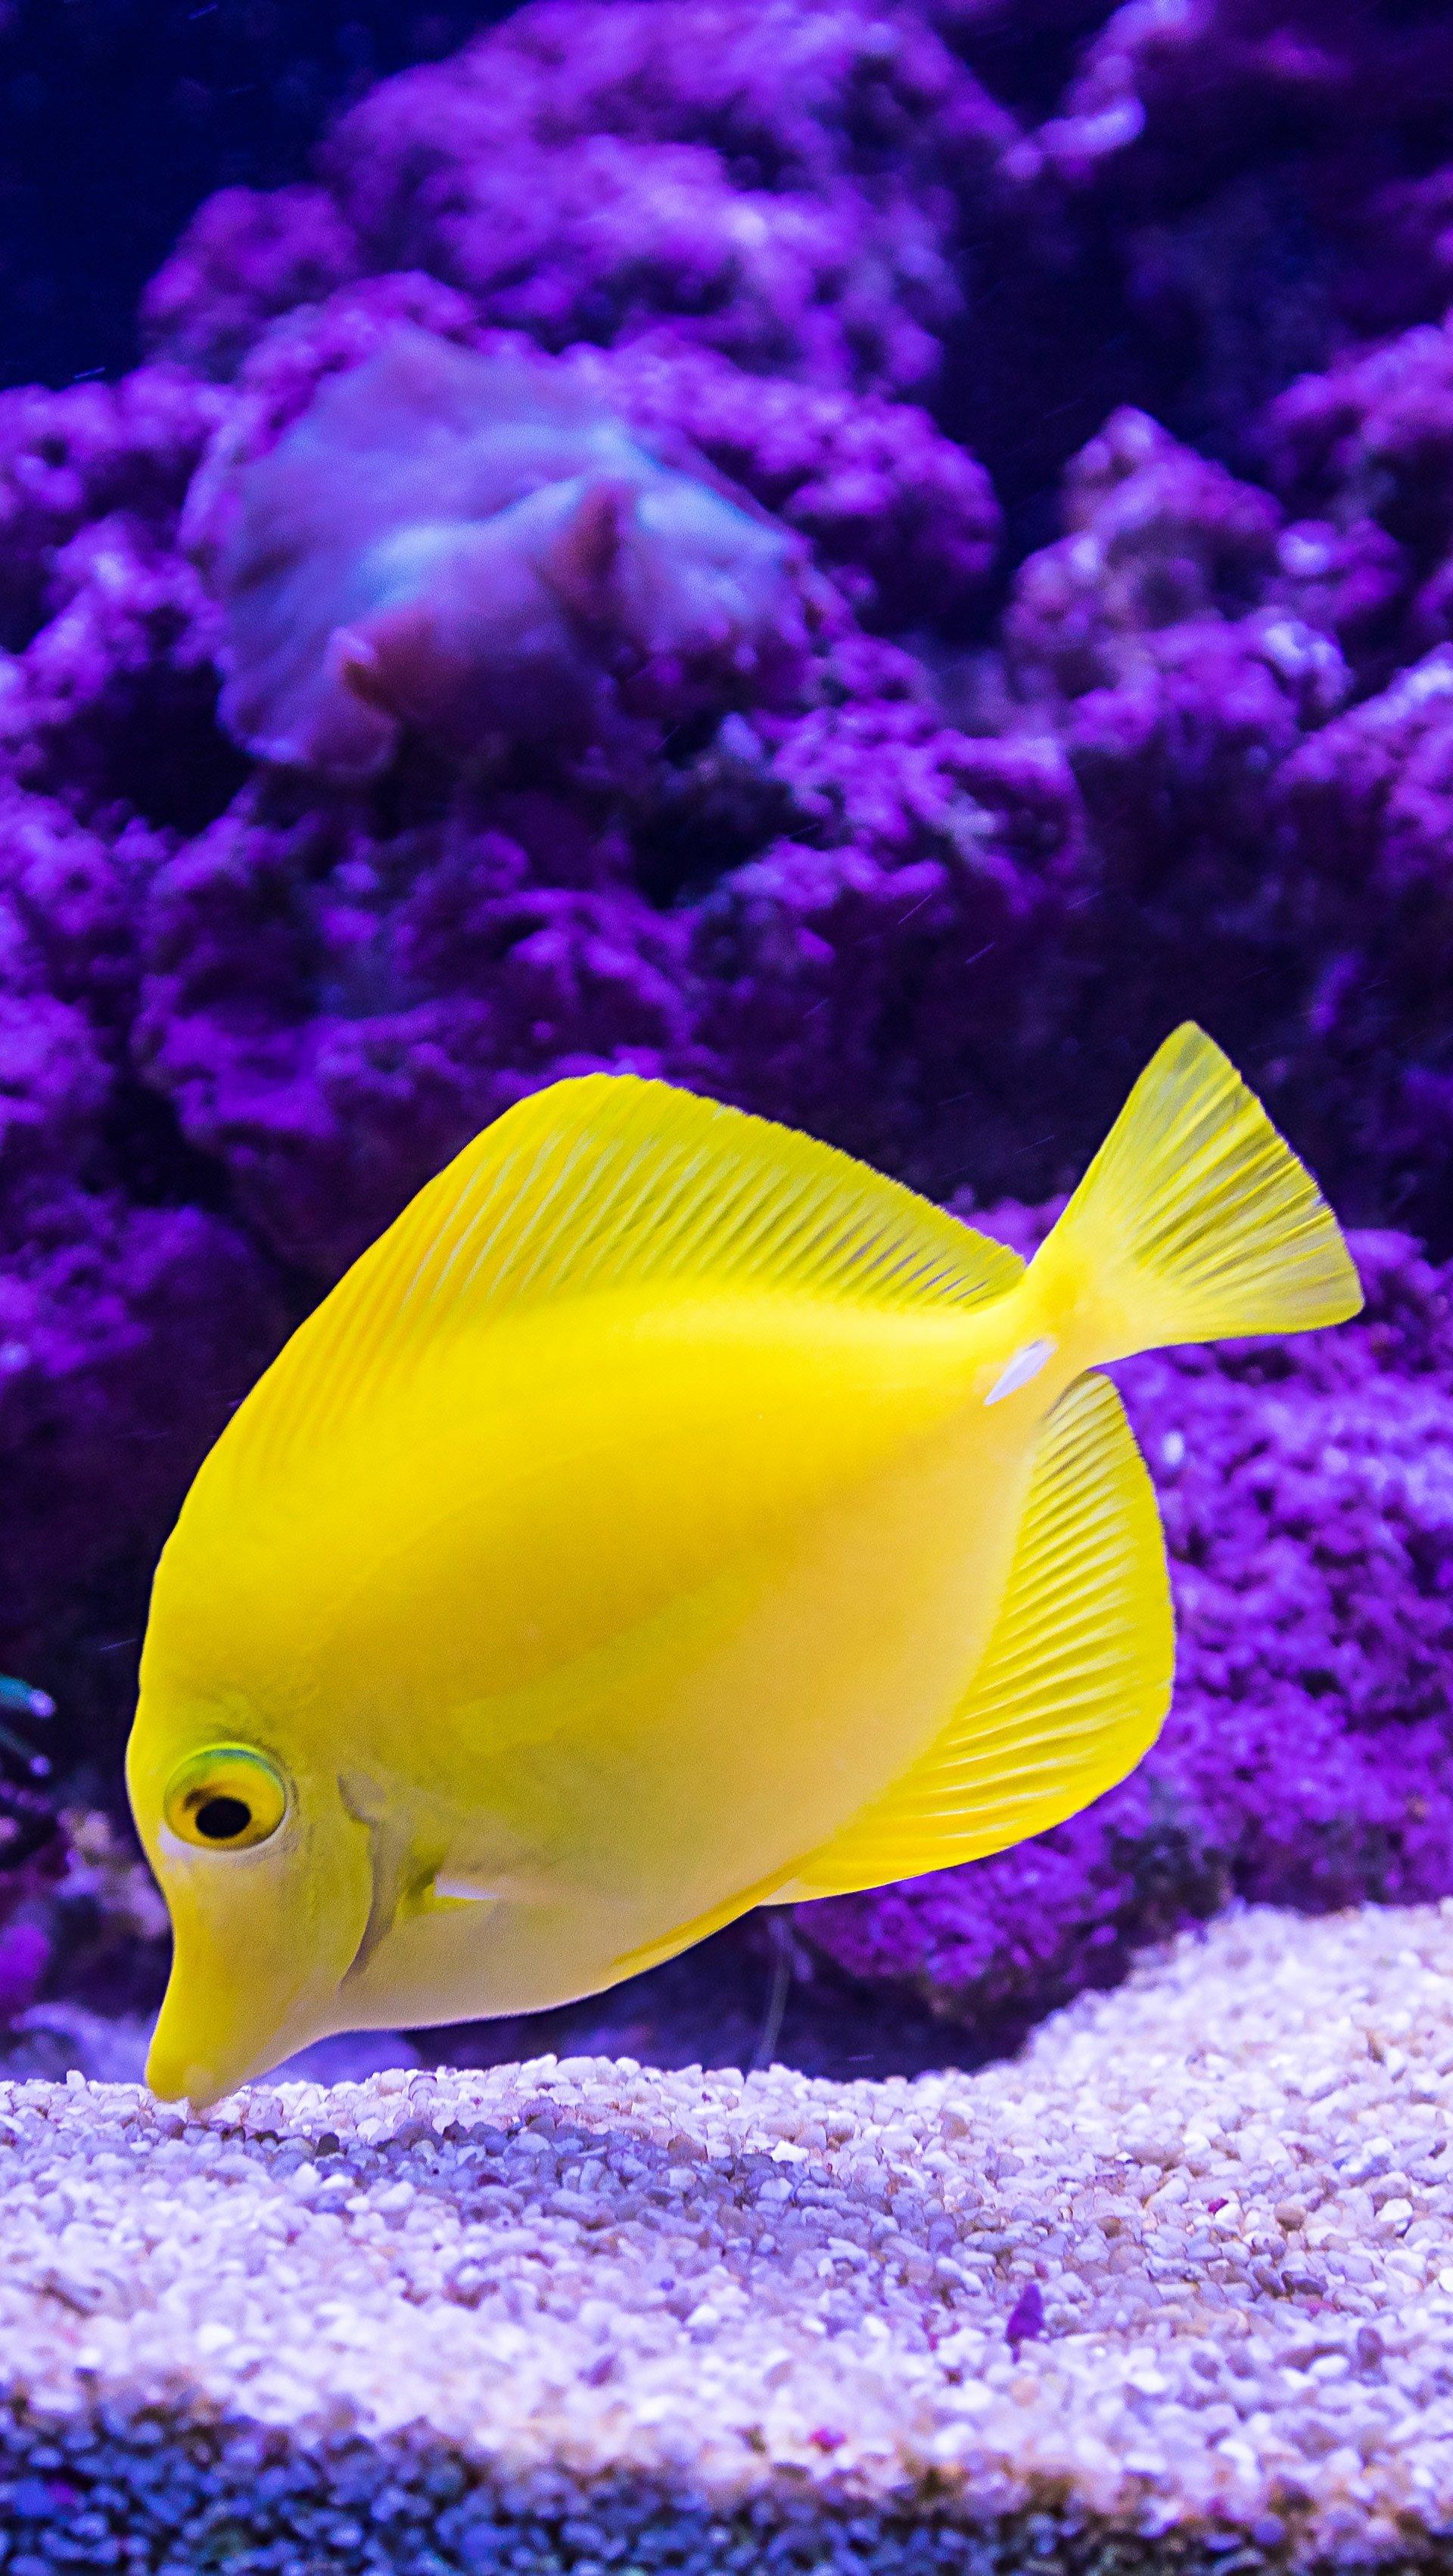 Wallpaper Yellow fish Vertical